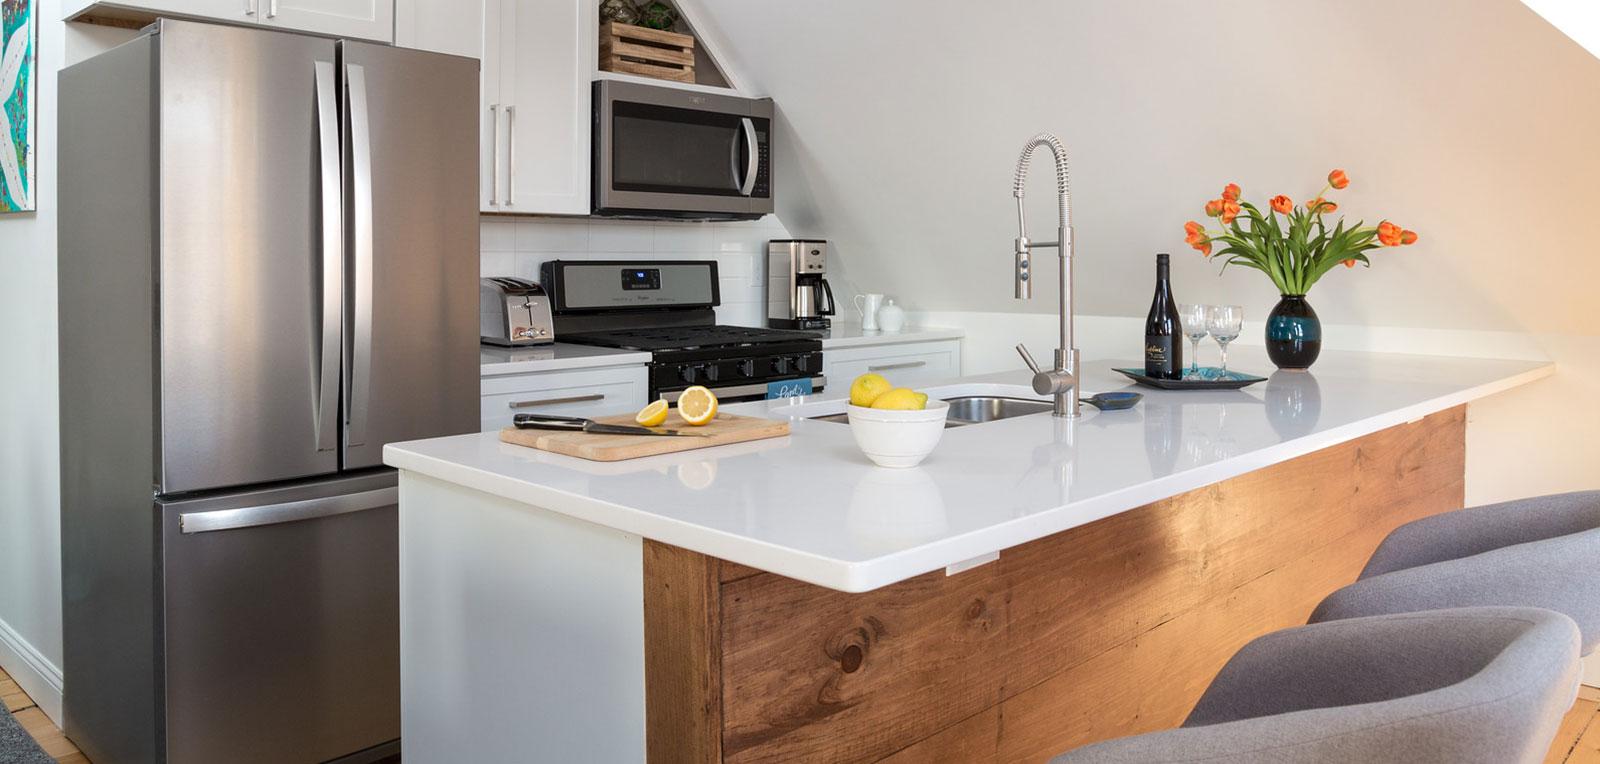 2BR Apartment Kitchen | ADMIRAL SIMS B&B, Newport Rhode Island